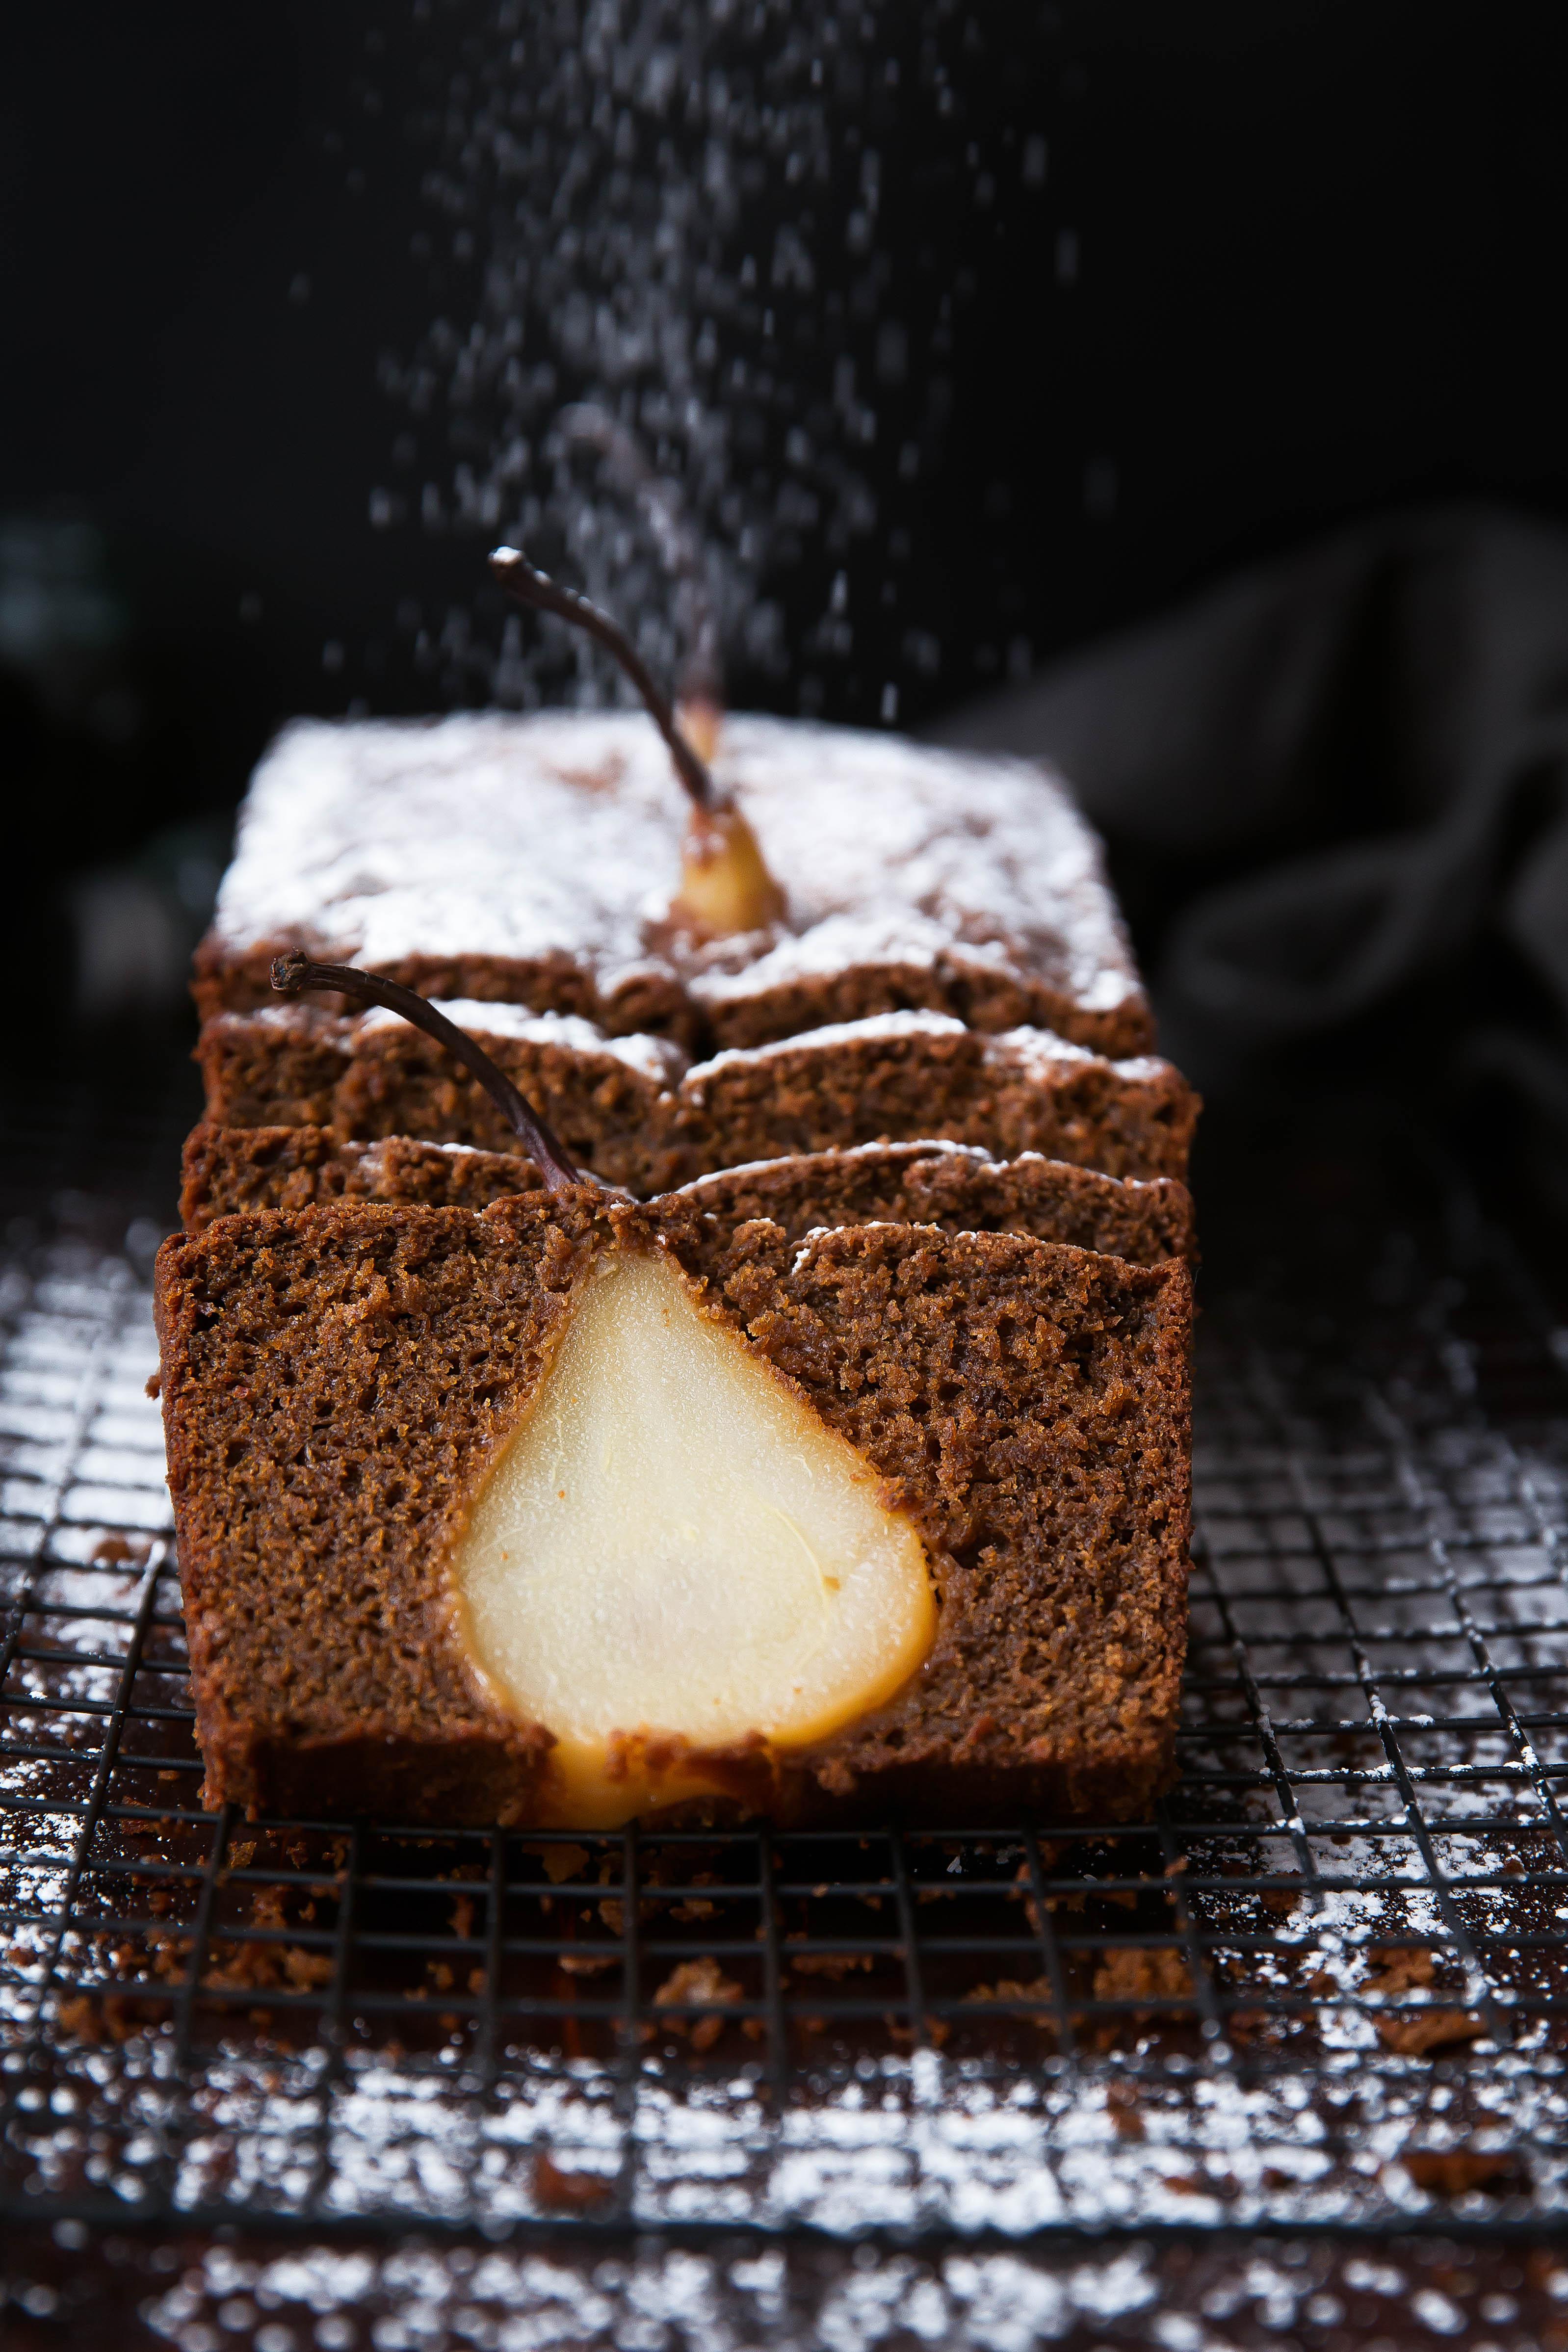 sprinkling powdered sugar onto gingerbread loaf